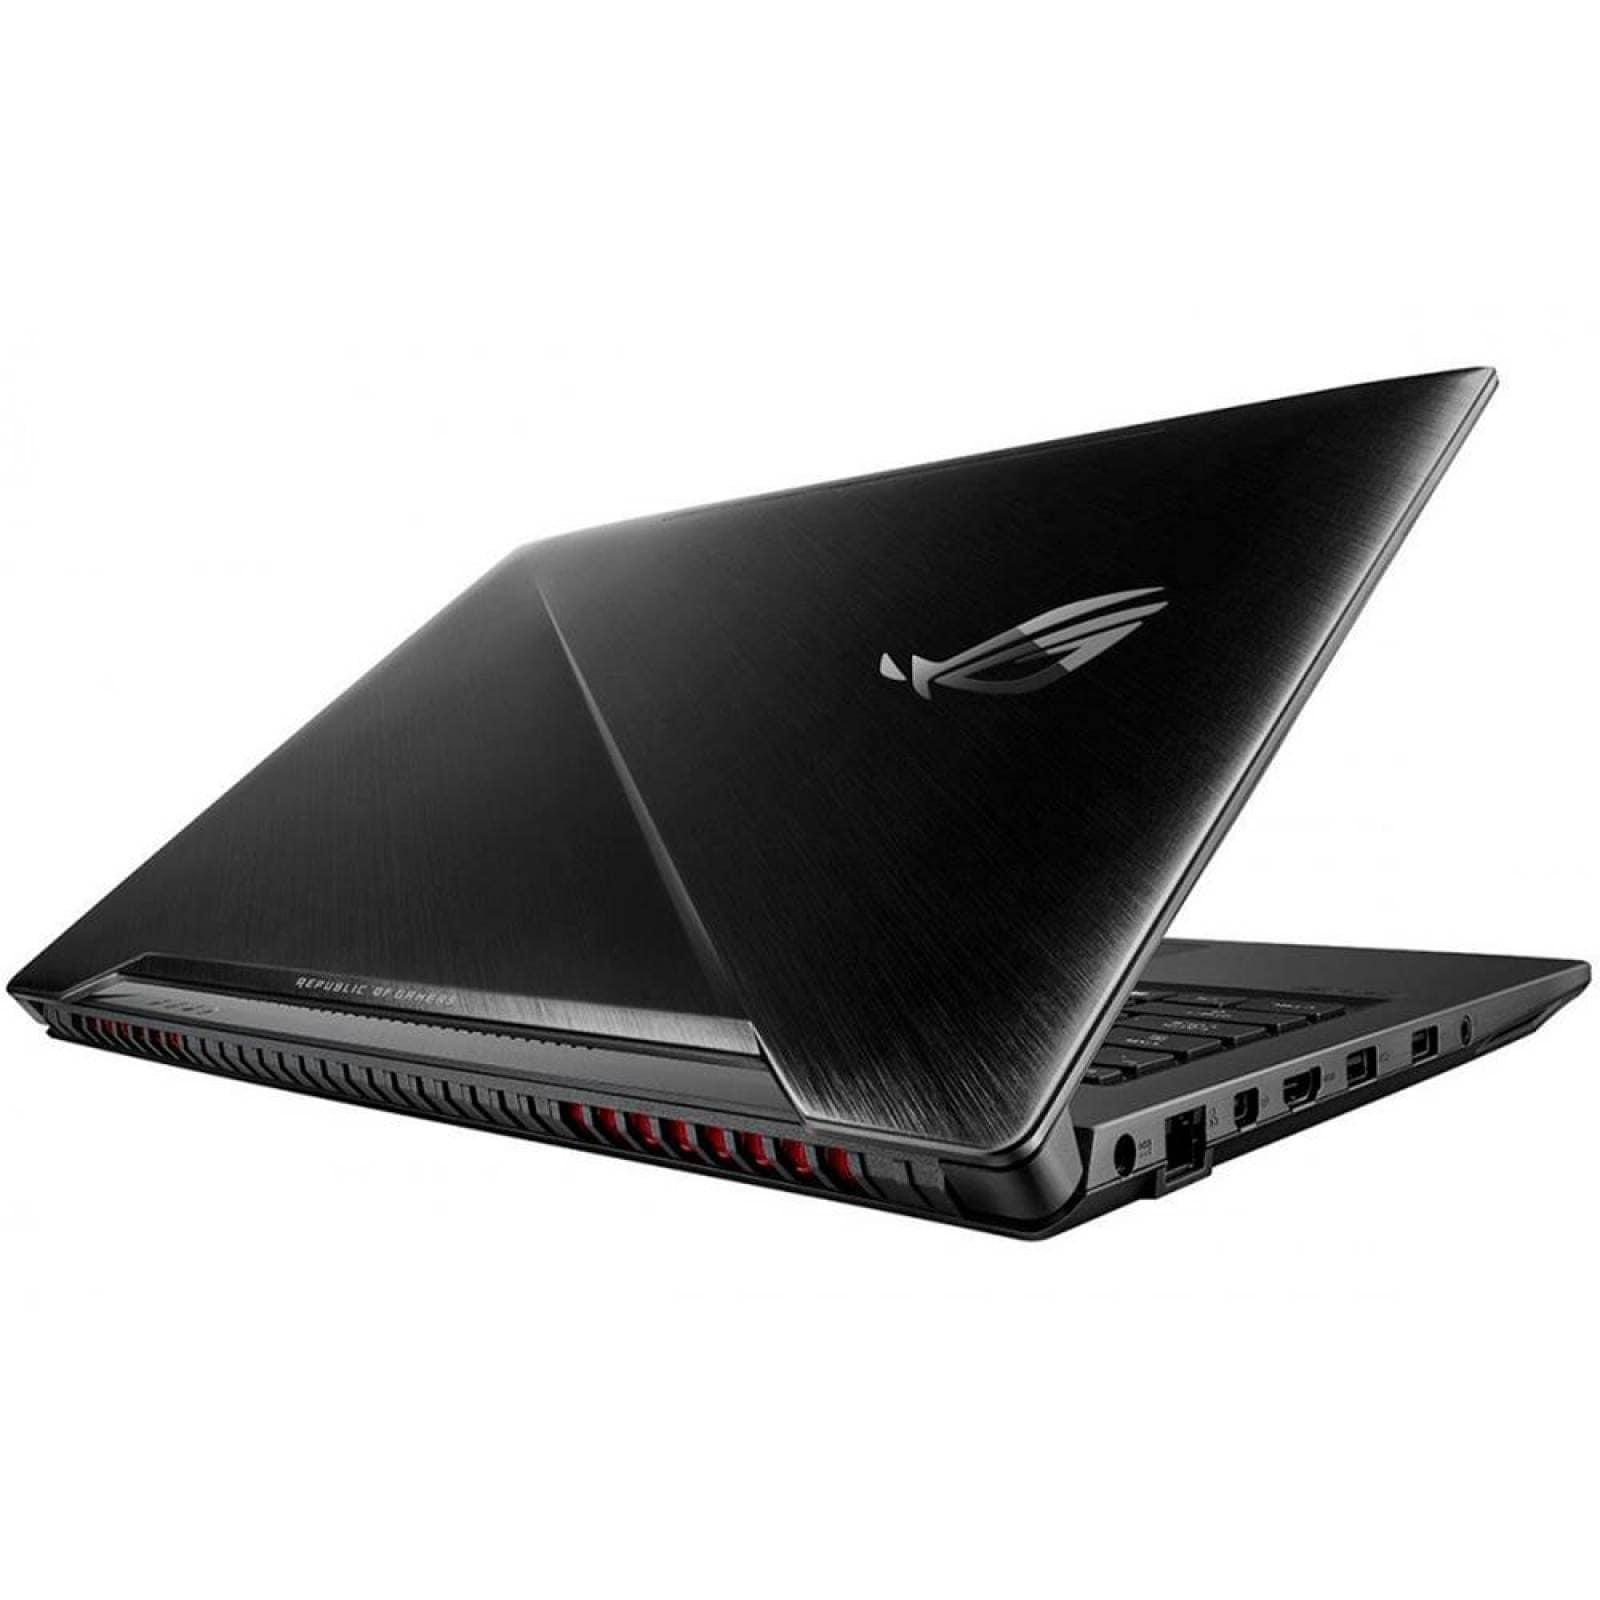 Laptop Gamer ASUS ROG I7-7700HQ 12GB 1TB GTX 1050 15.6''  GL503VD-FY275T  6M ReAcodicionado